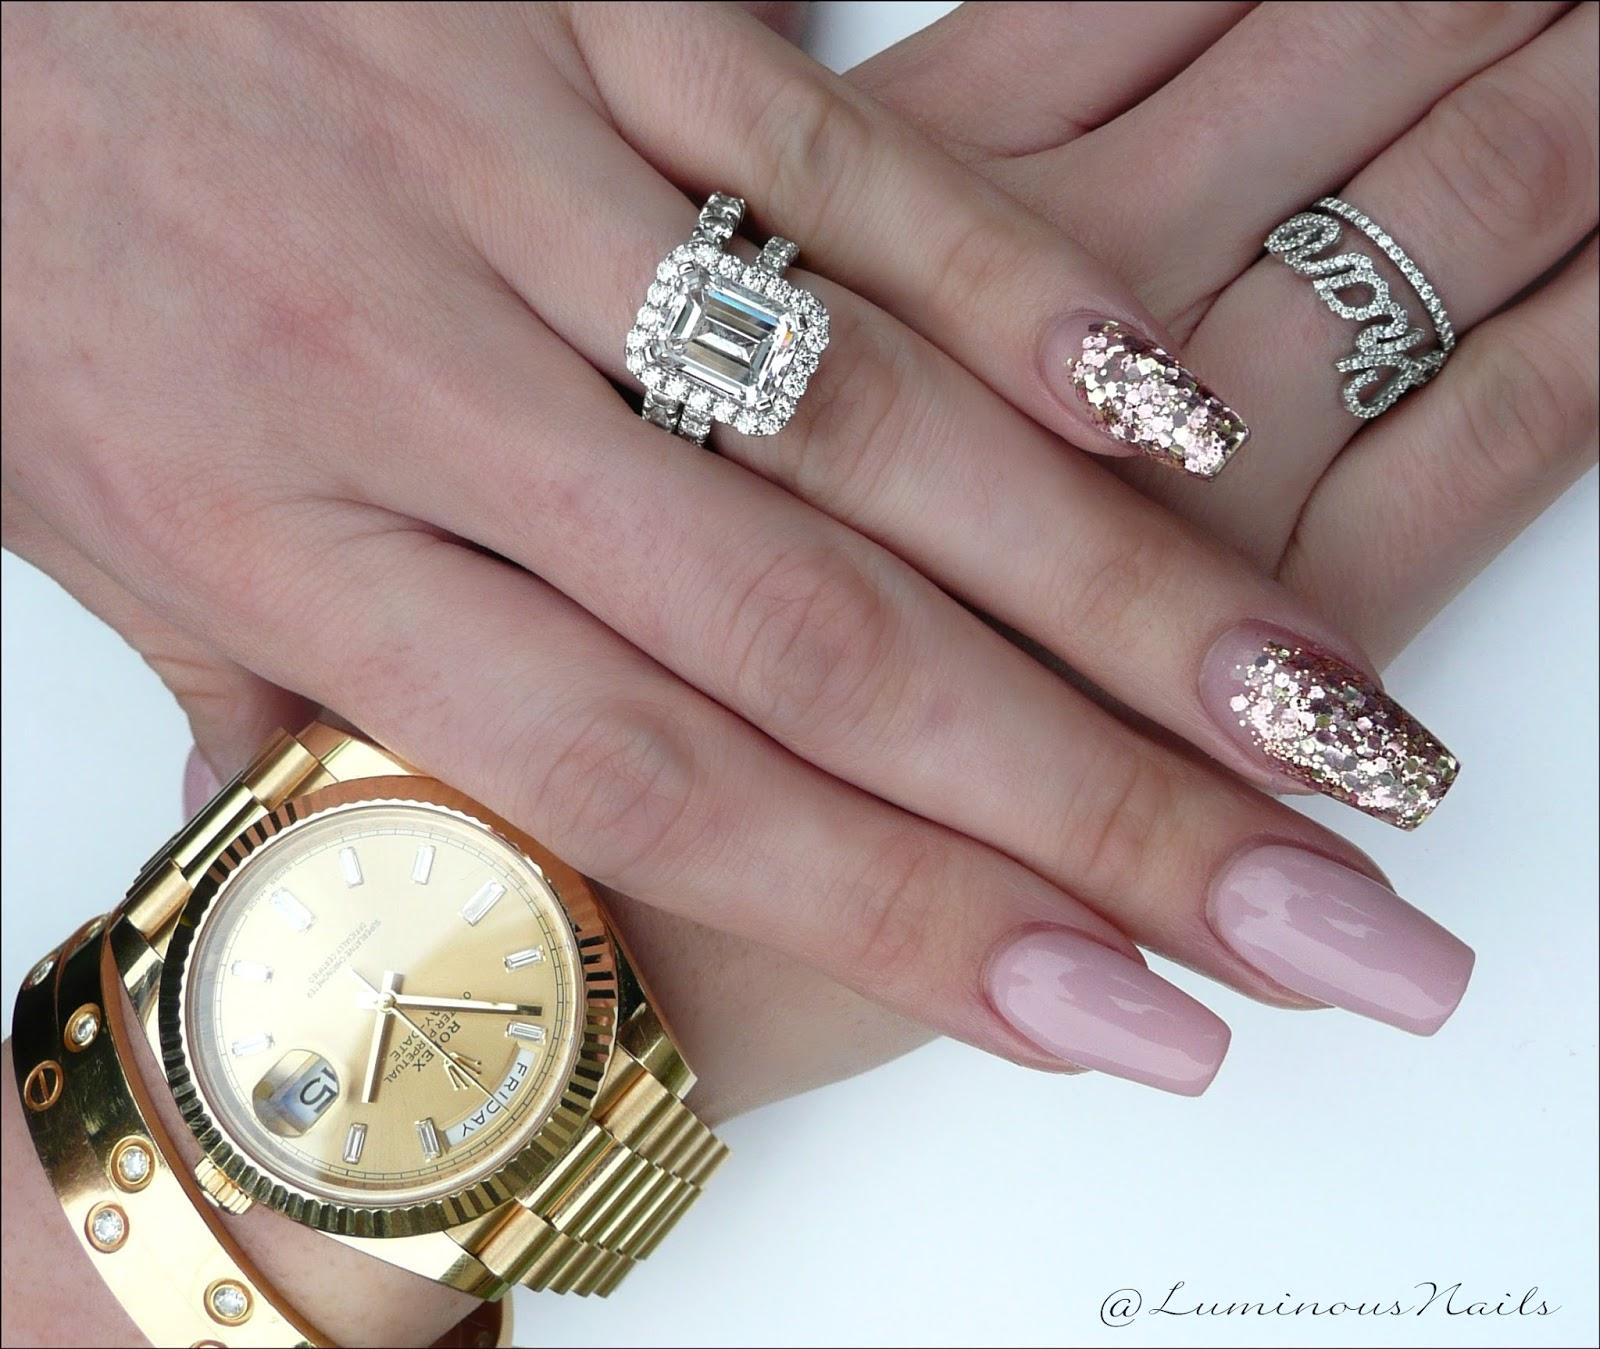 luminous nails: nude pink & glittery gold acrylic nails.